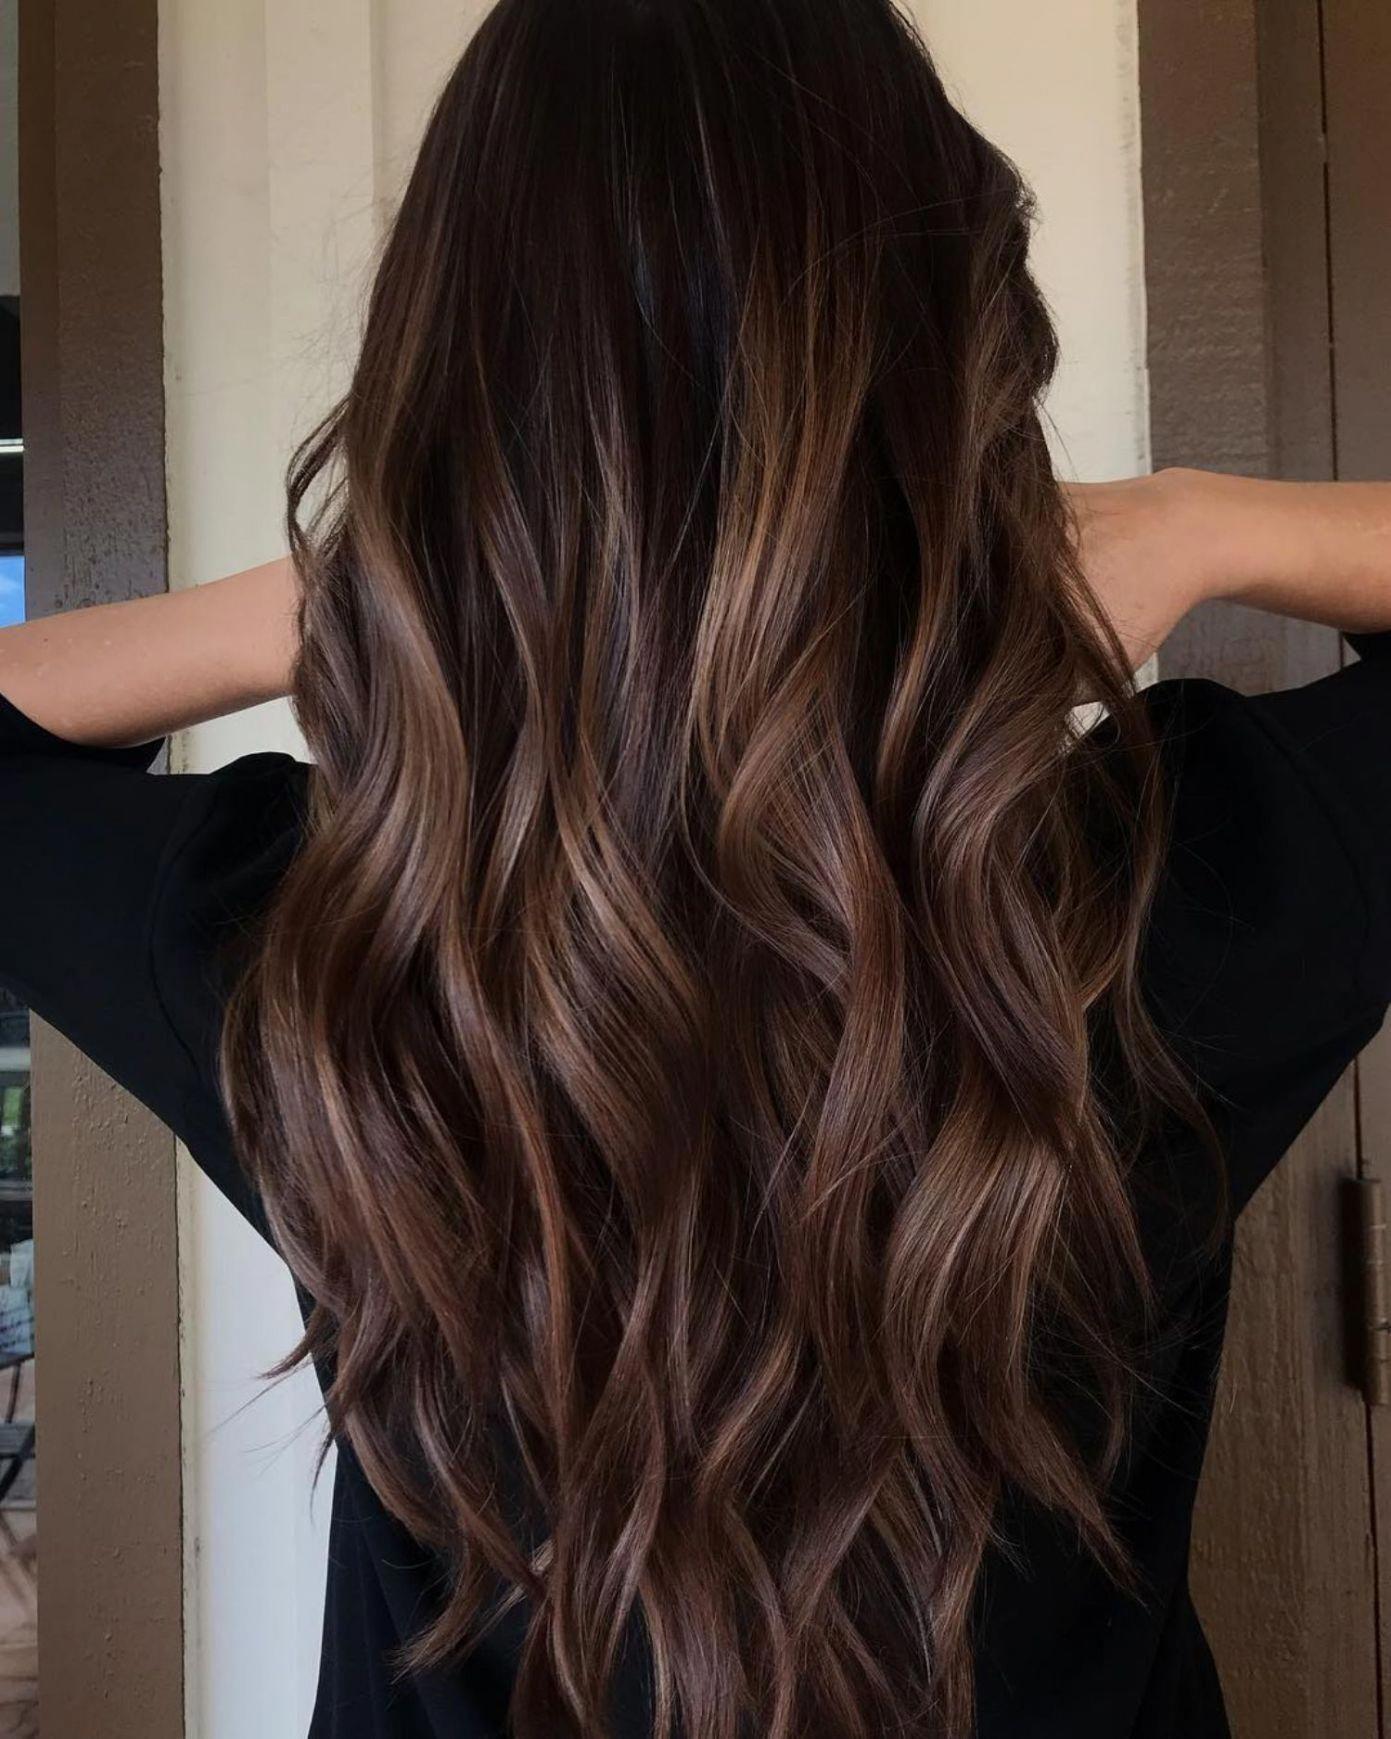 Subtle Shine Boosting Brunette Highlights Haircareroutine In 2020 Long Brunette Hair Brown Blonde Hair Brown Hair With Highlights